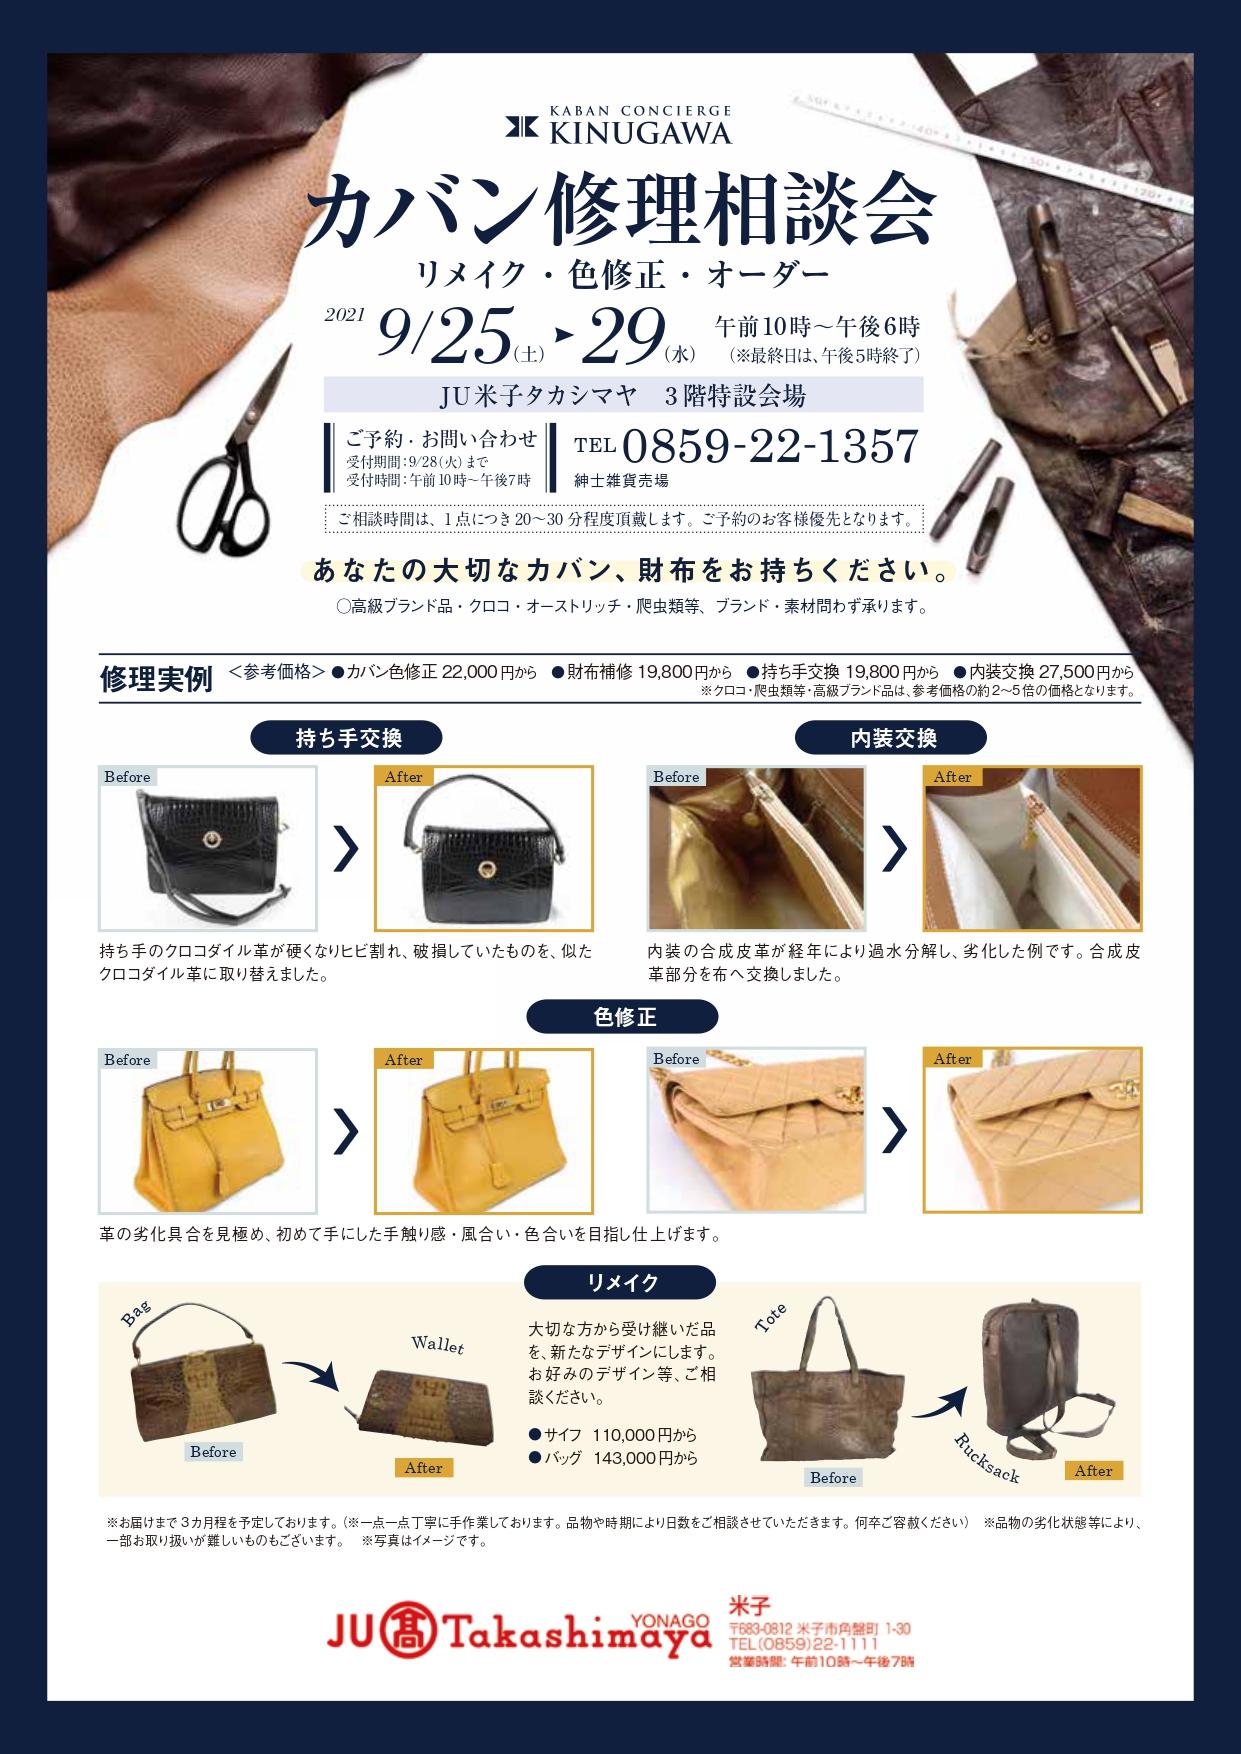 京都伊勢丹 カバン修理相談会